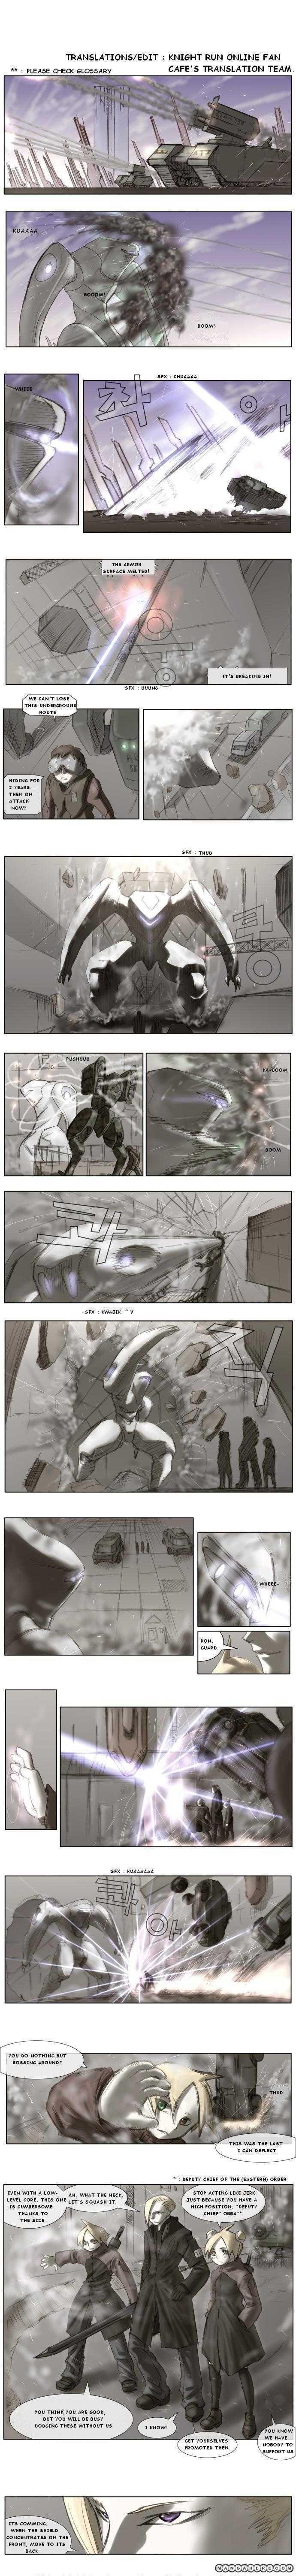 Knight Run 7 Page 1